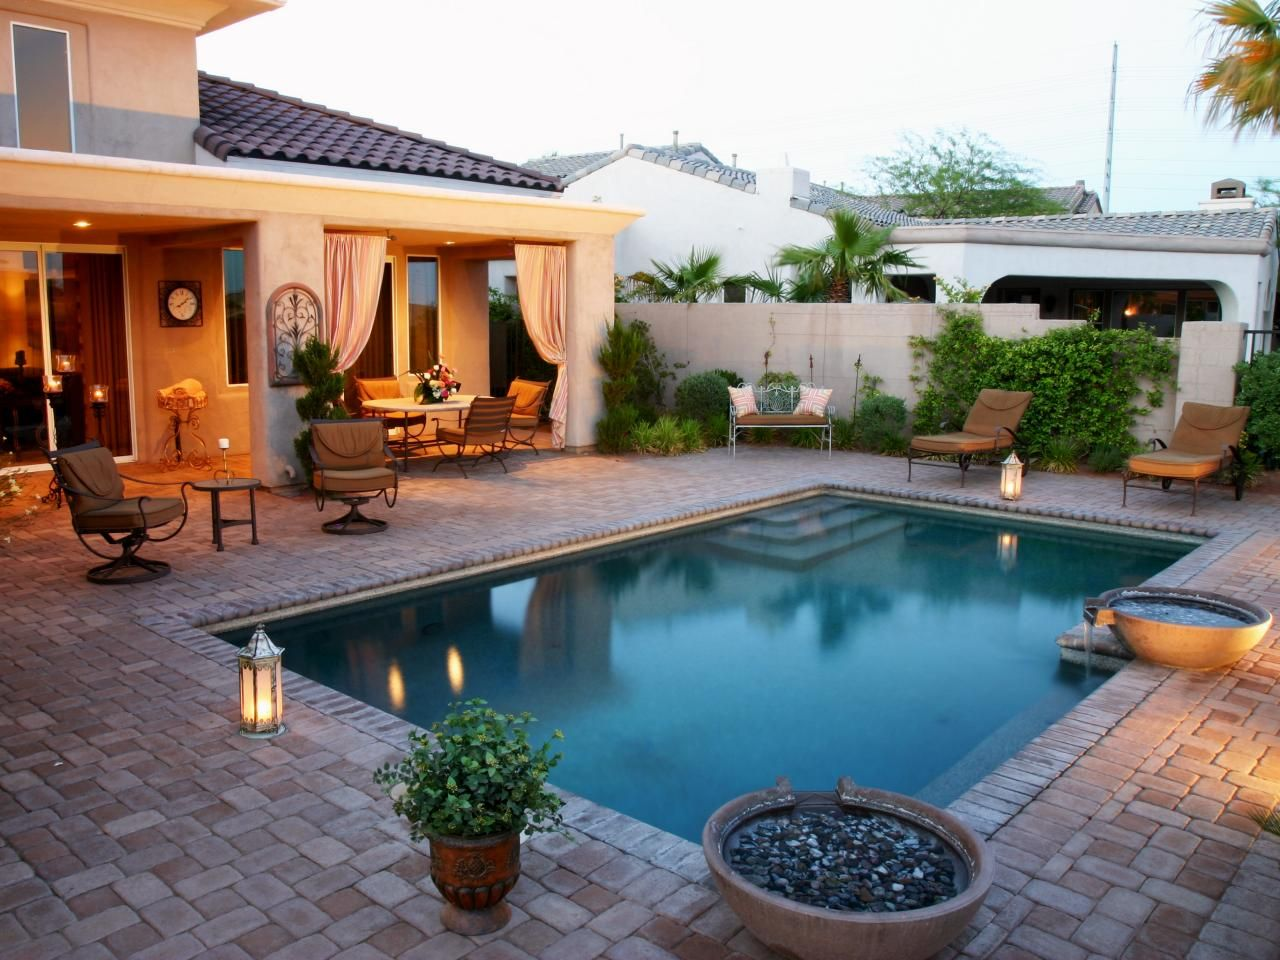 25 Best Ideas For Backyard Pools   Backyard, Backyard Pool Designs And Pool  Designs